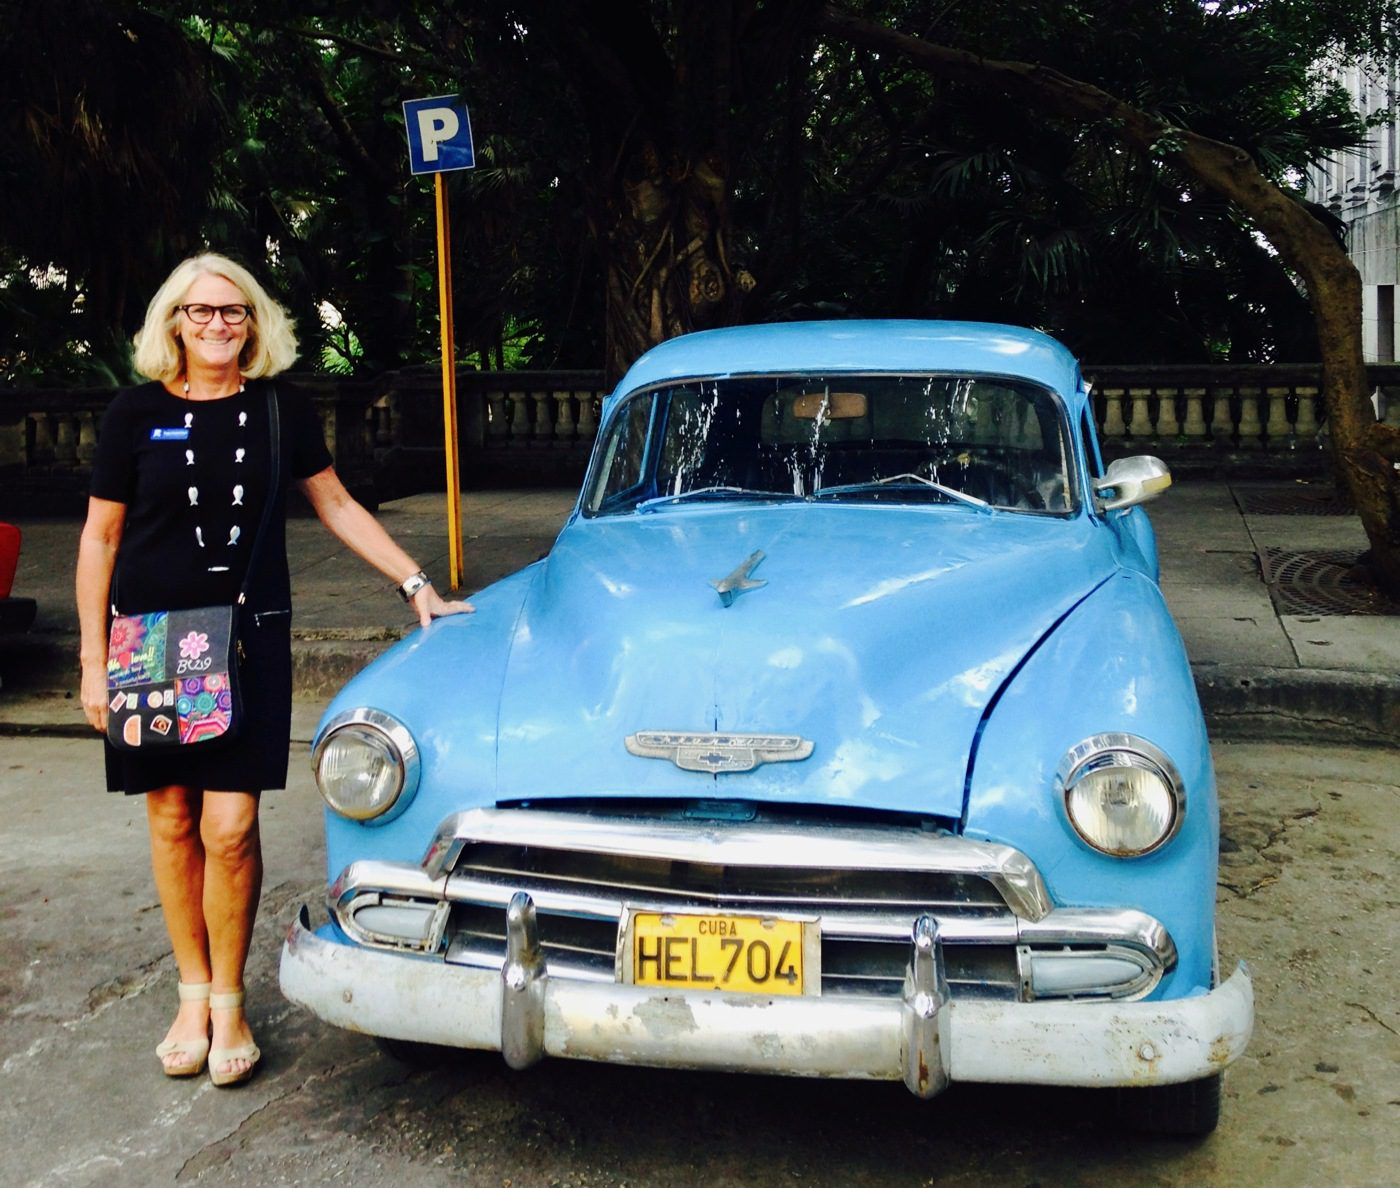 With a vintage car in Havana, Cuba.